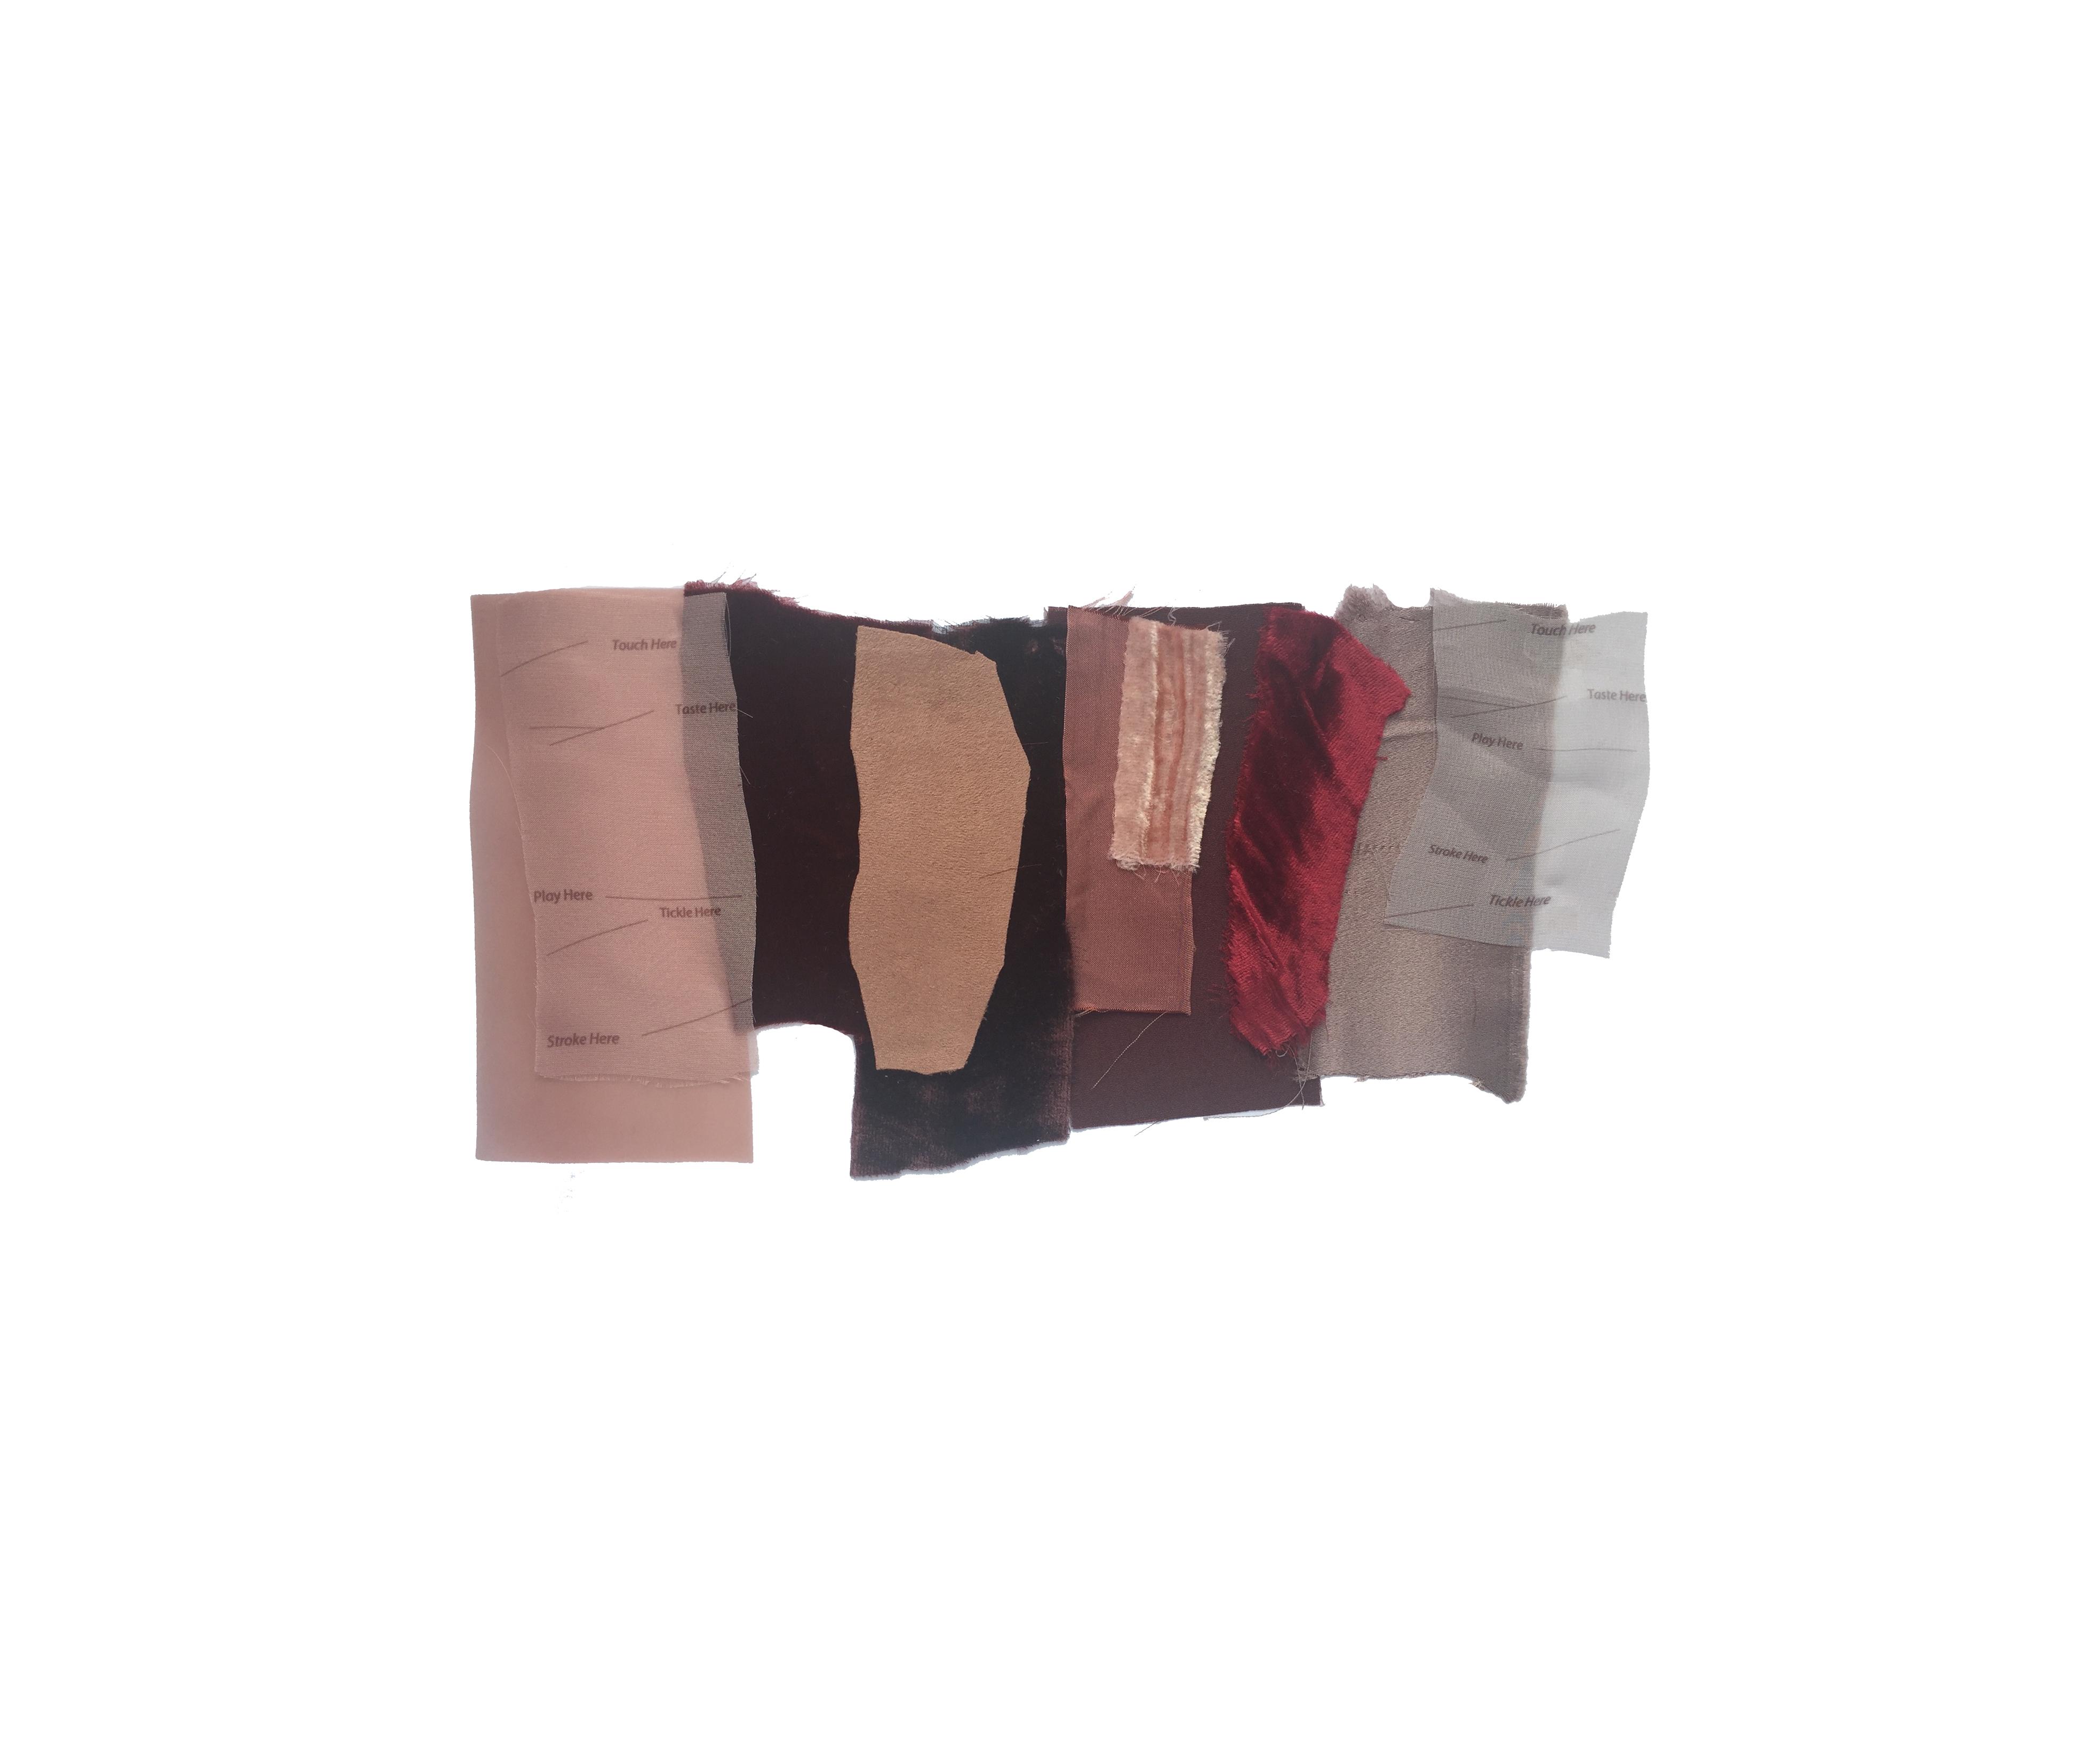 blush fabric samples